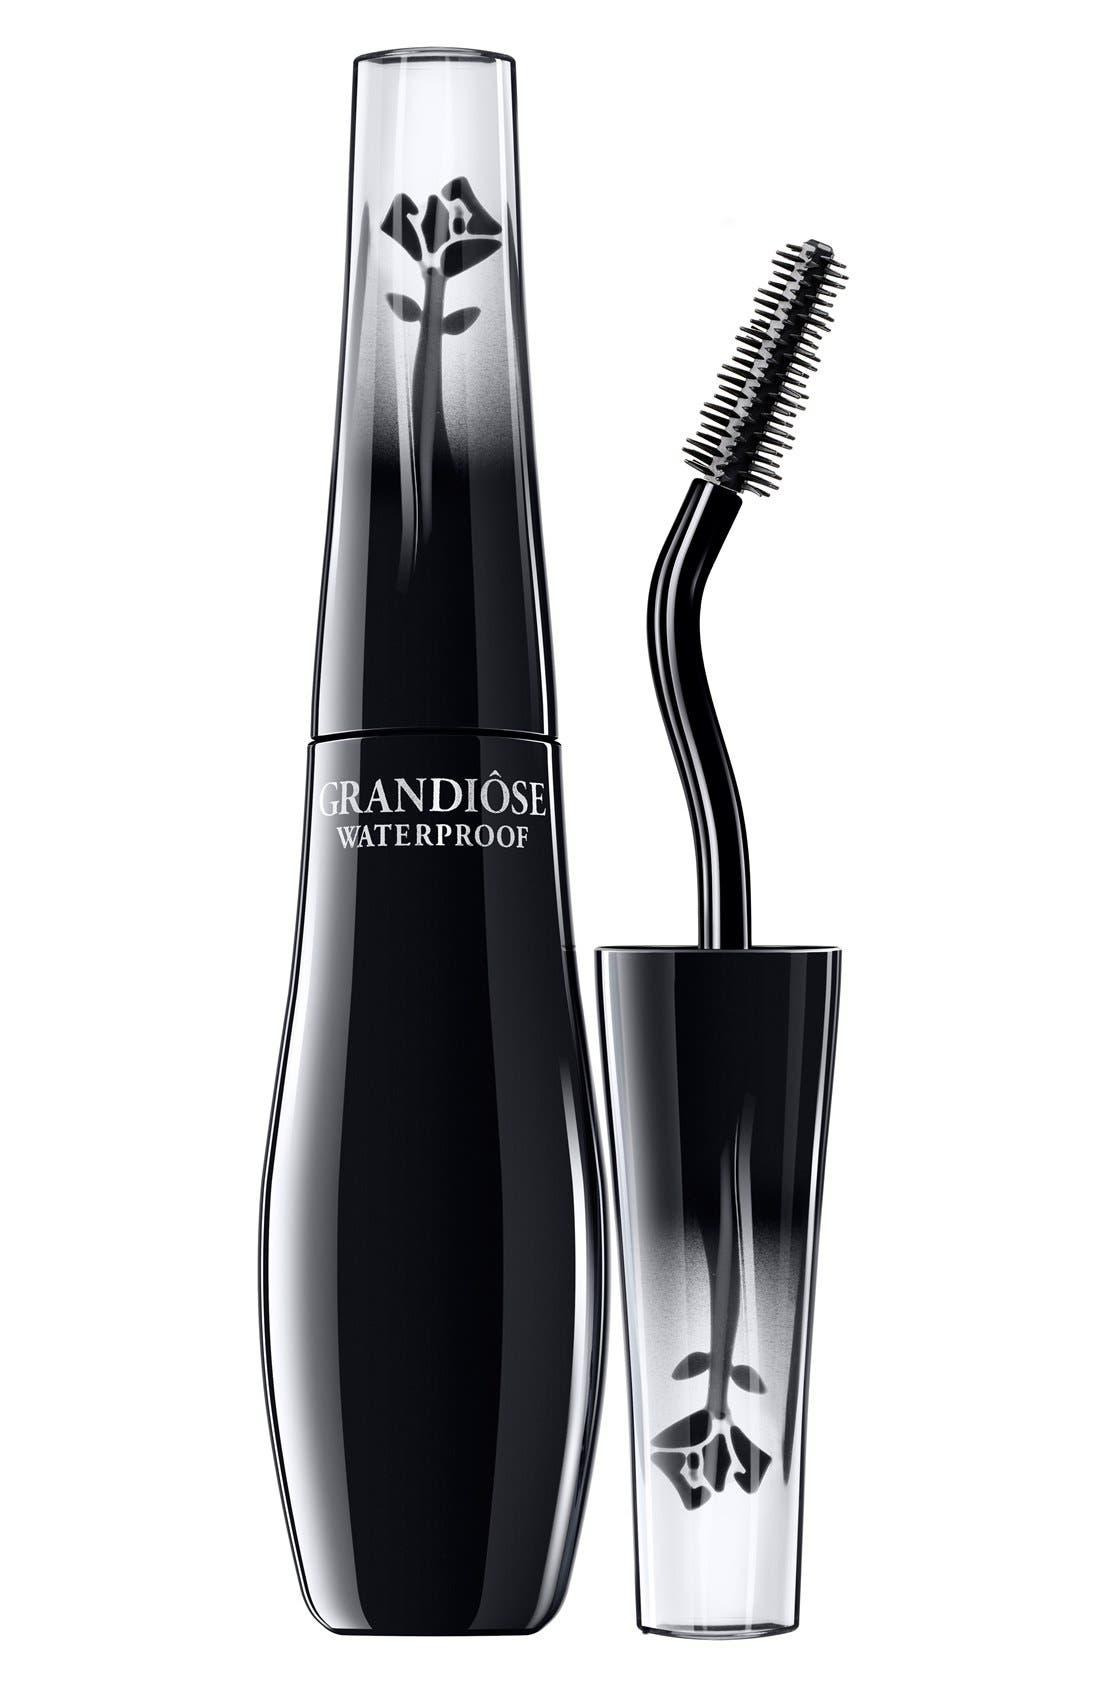 Lancôme Grandiose Multi-Benefit Lengthening, Lifting and Volumizing Waterproof Mascara